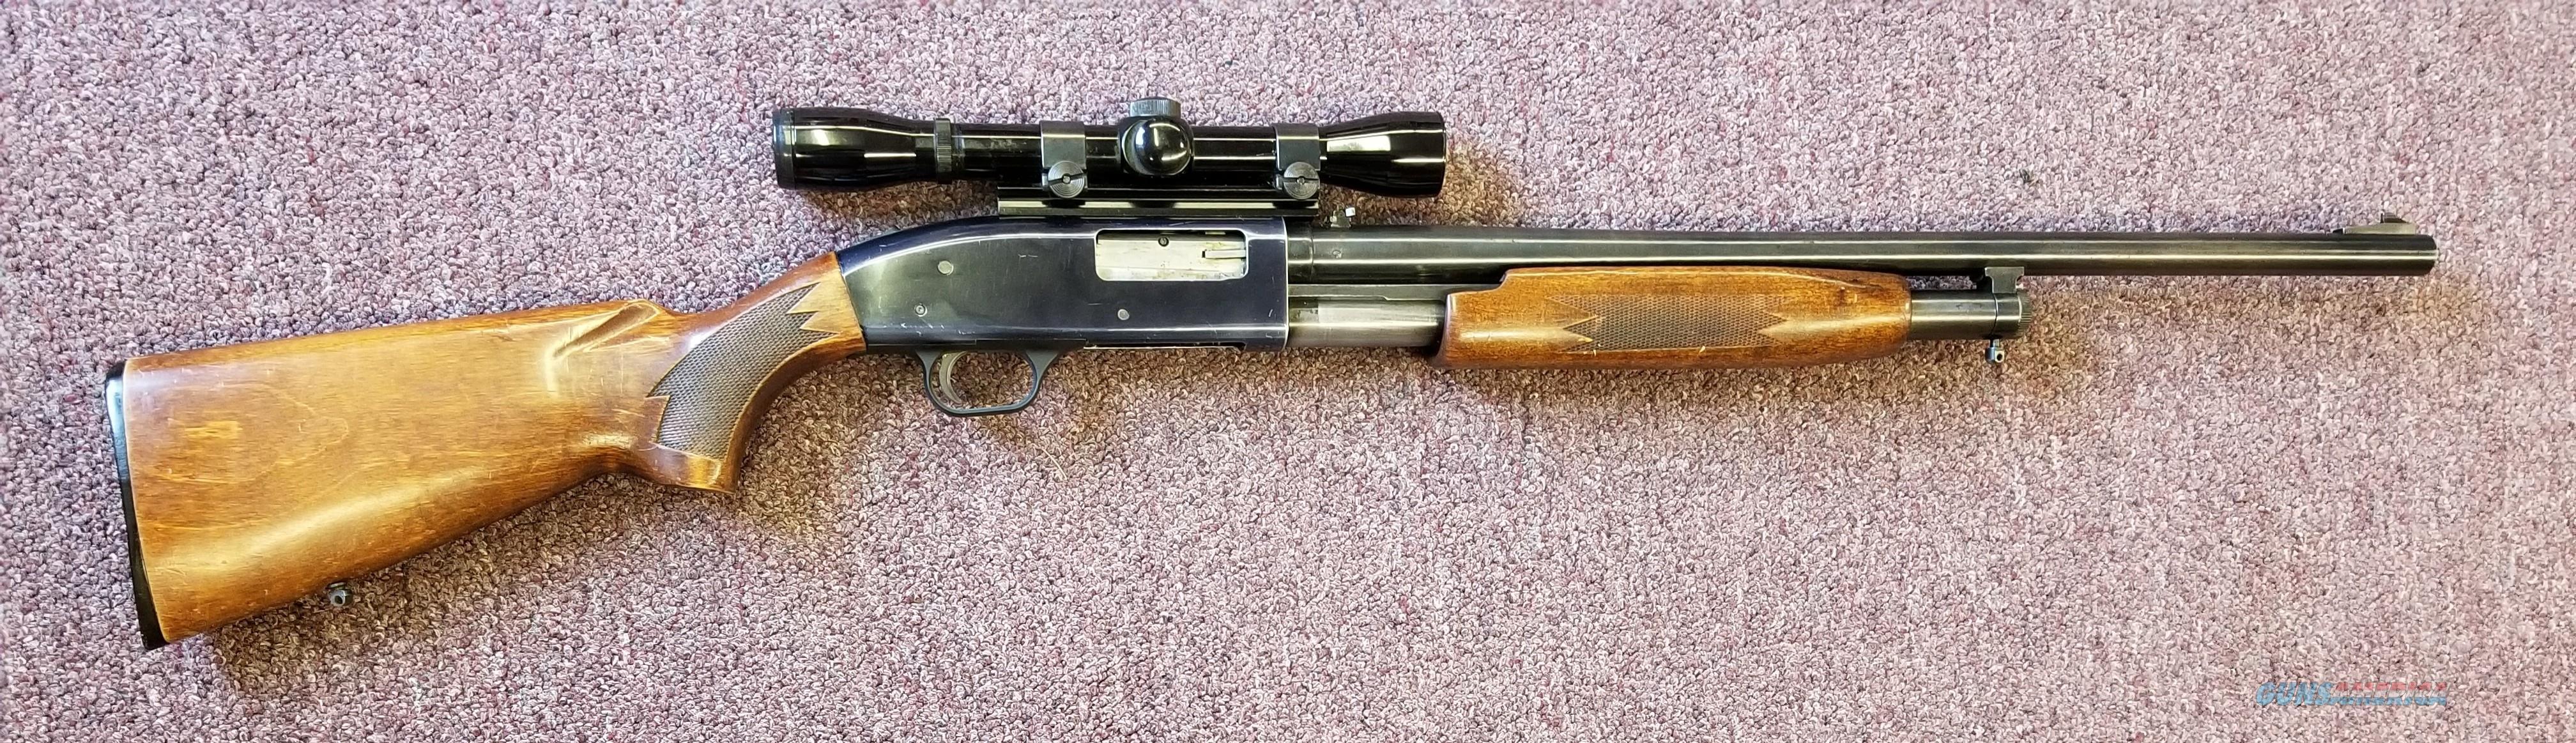 Mossberg 600 12 Gauge Pump - Optics - Free Shipping  Guns > Shotguns > Mossberg Shotguns > Pump > Sporting